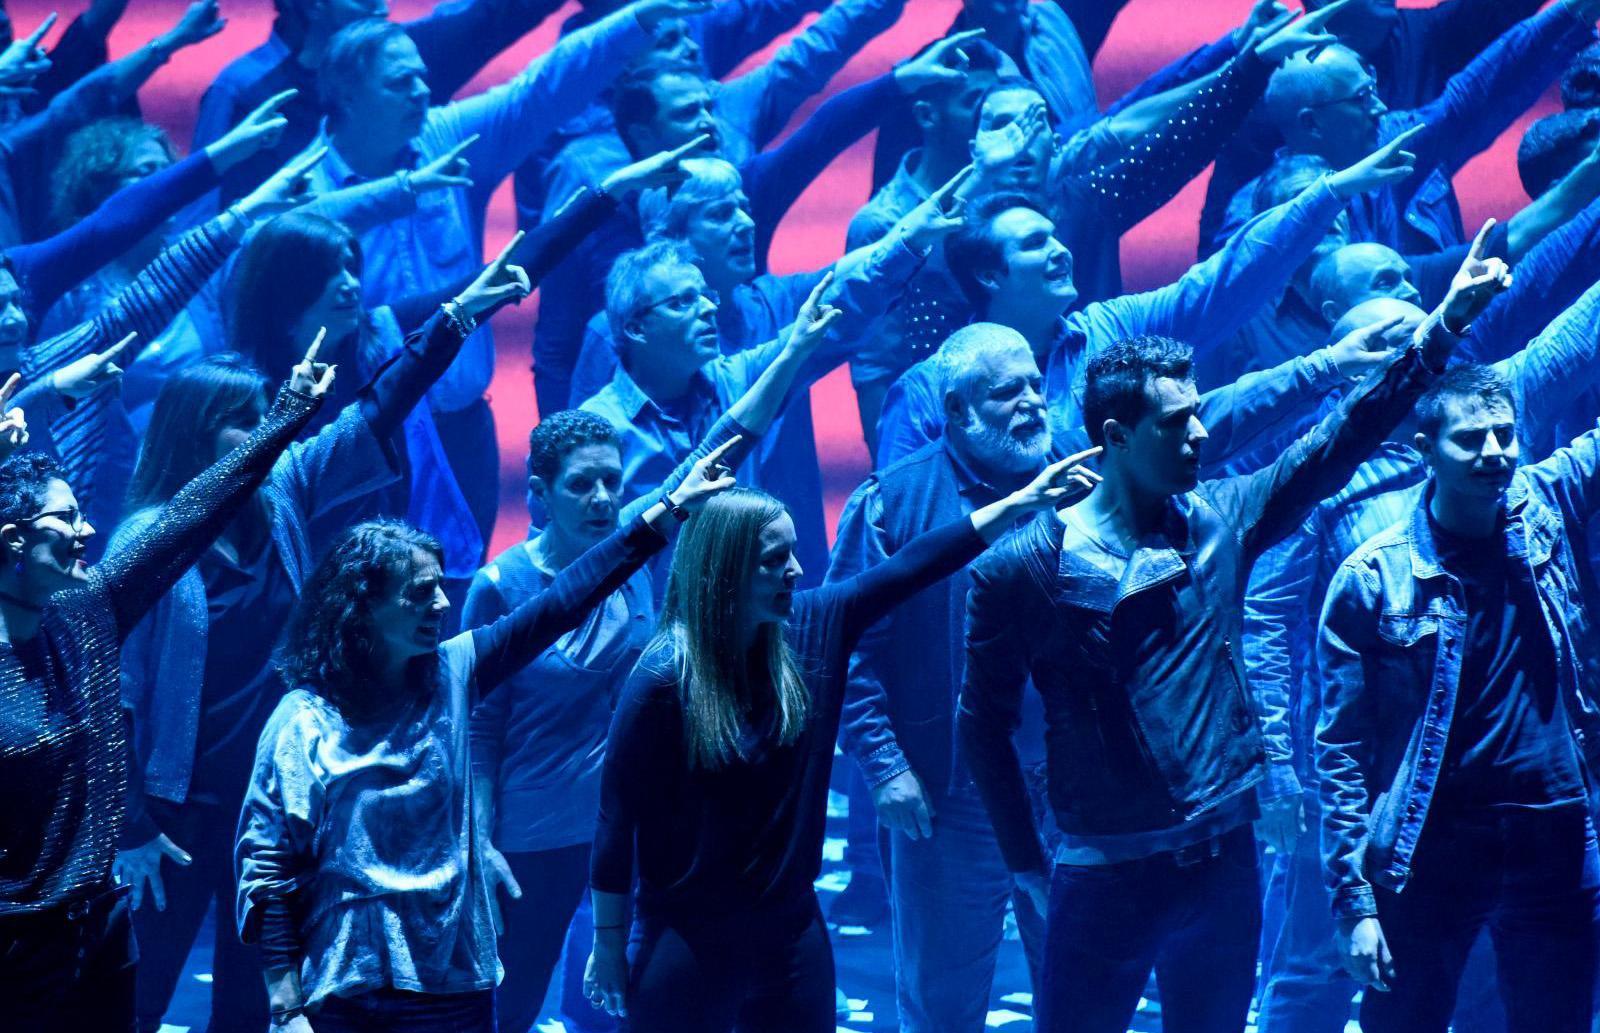 El Musical: Grandes Éxitos trae Broadway a Caixa Forum Sevilla